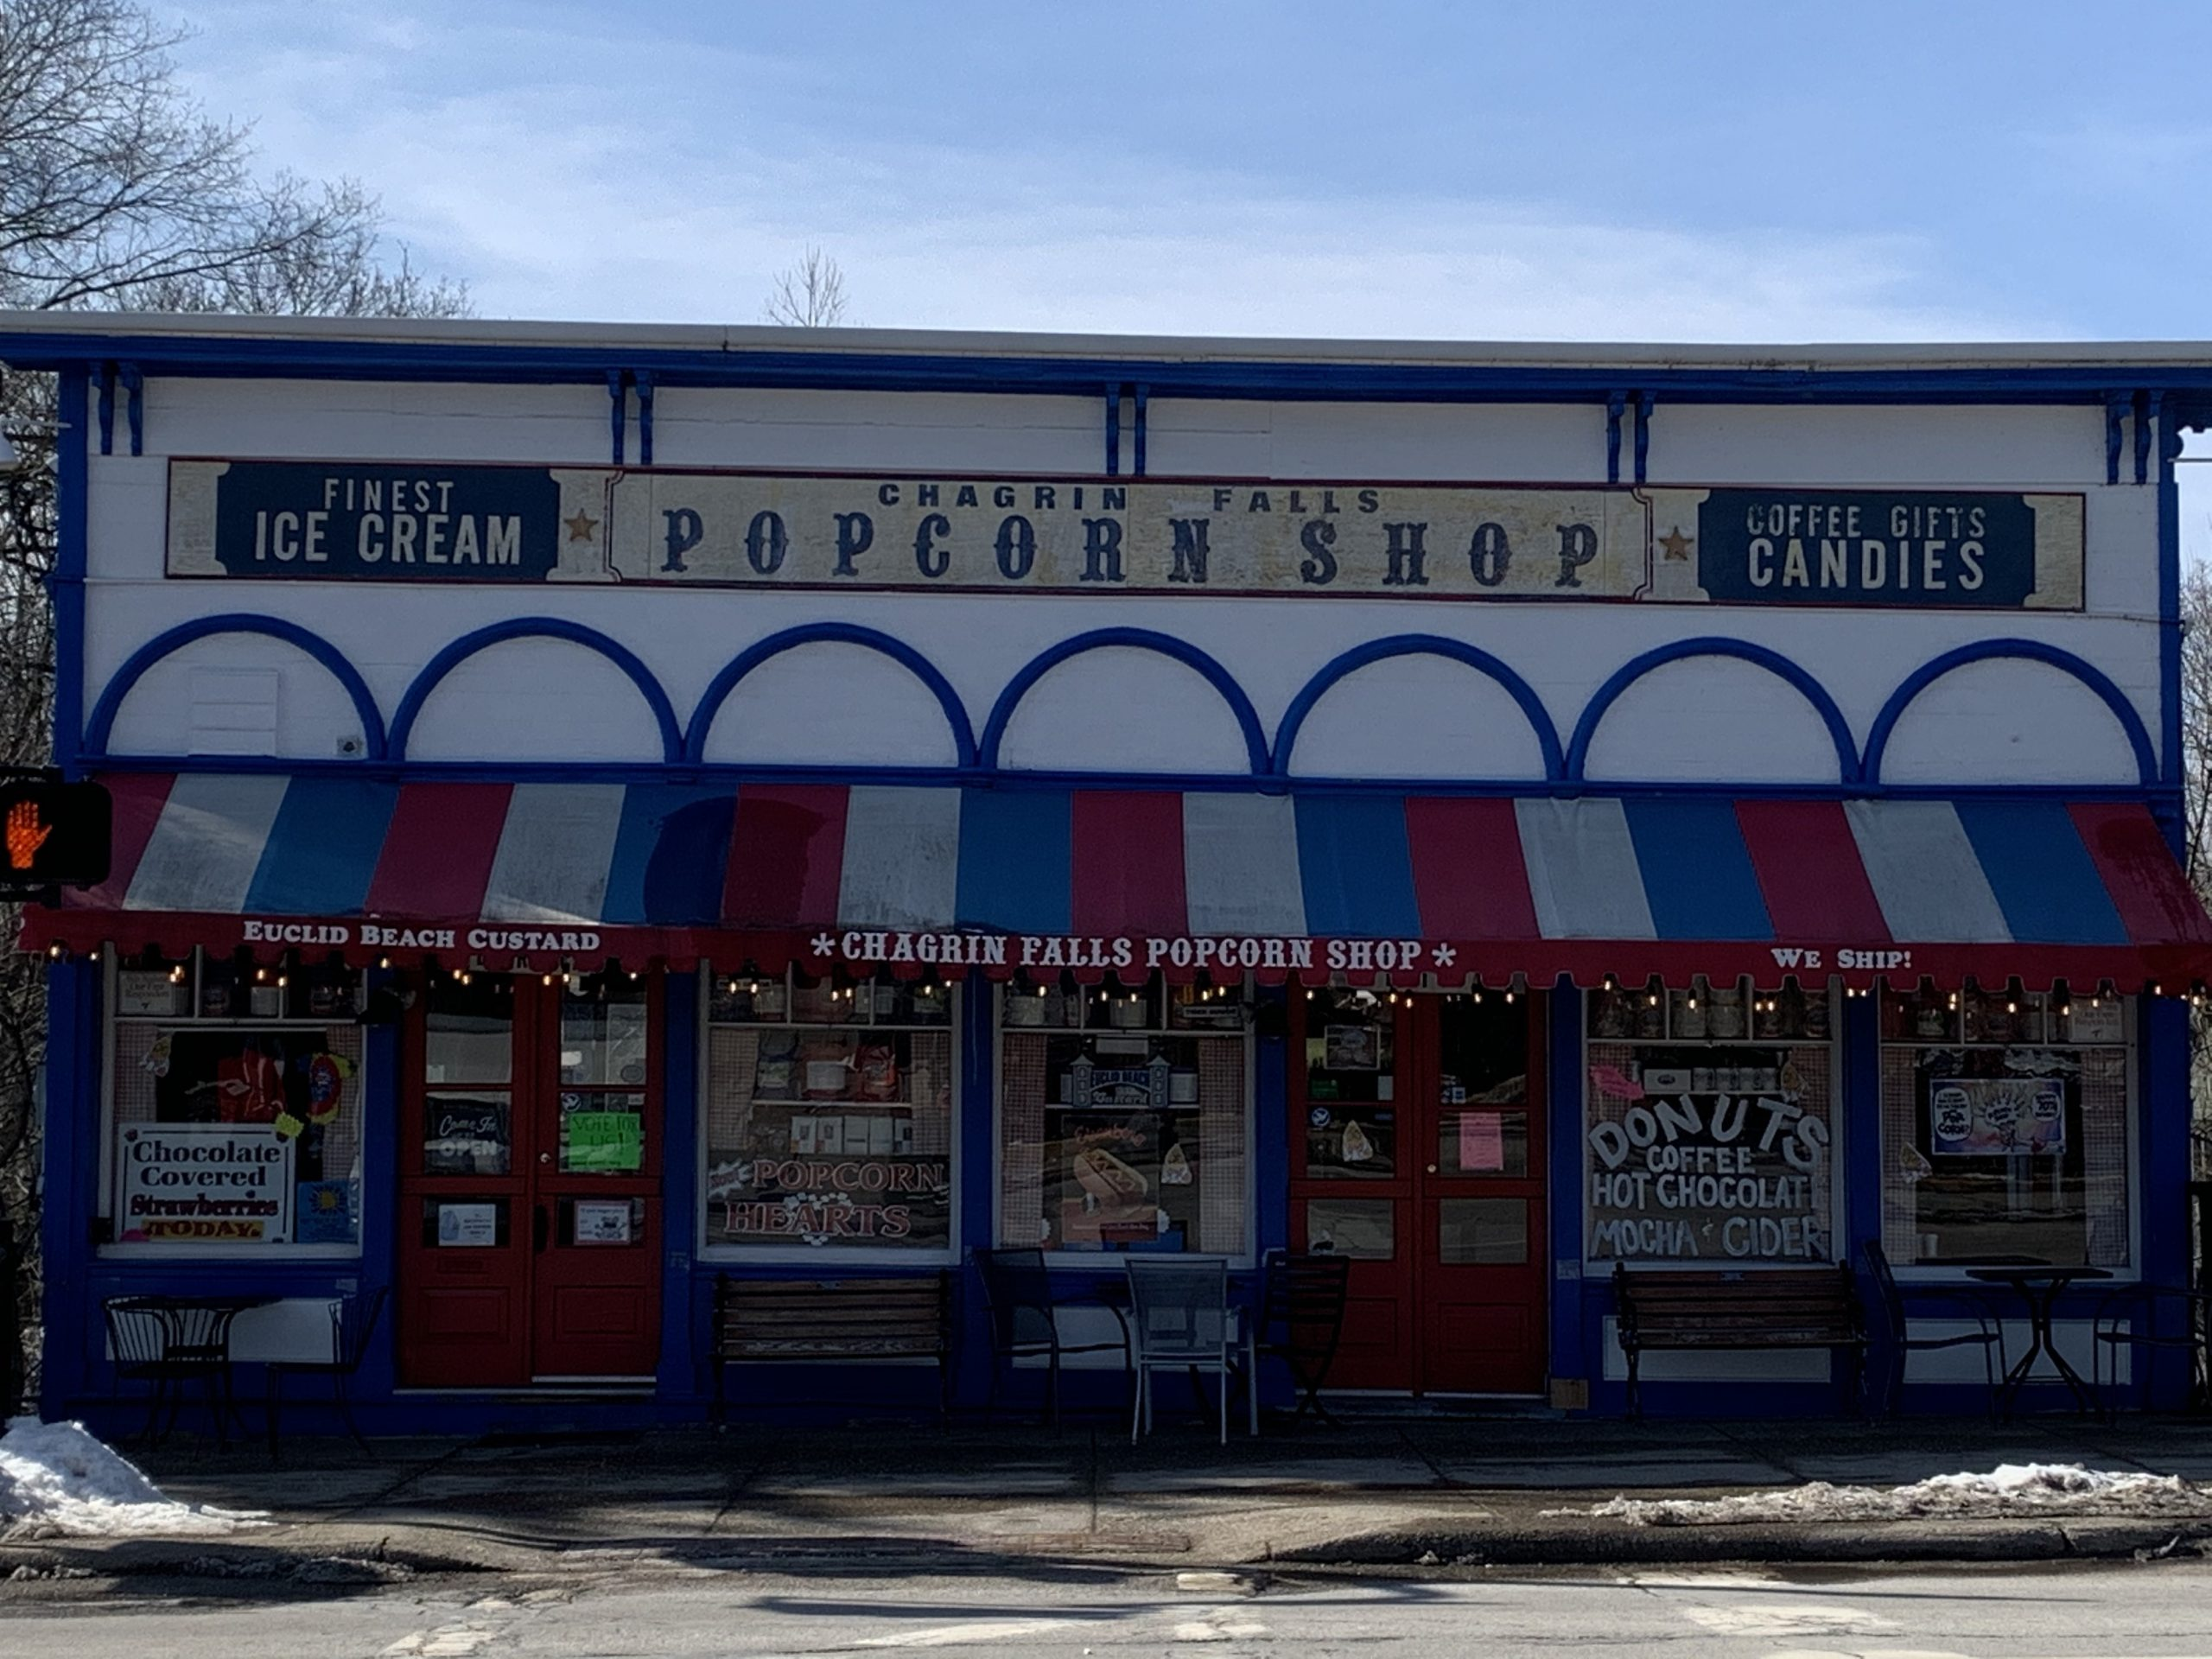 popcorn shop-chagrin falls